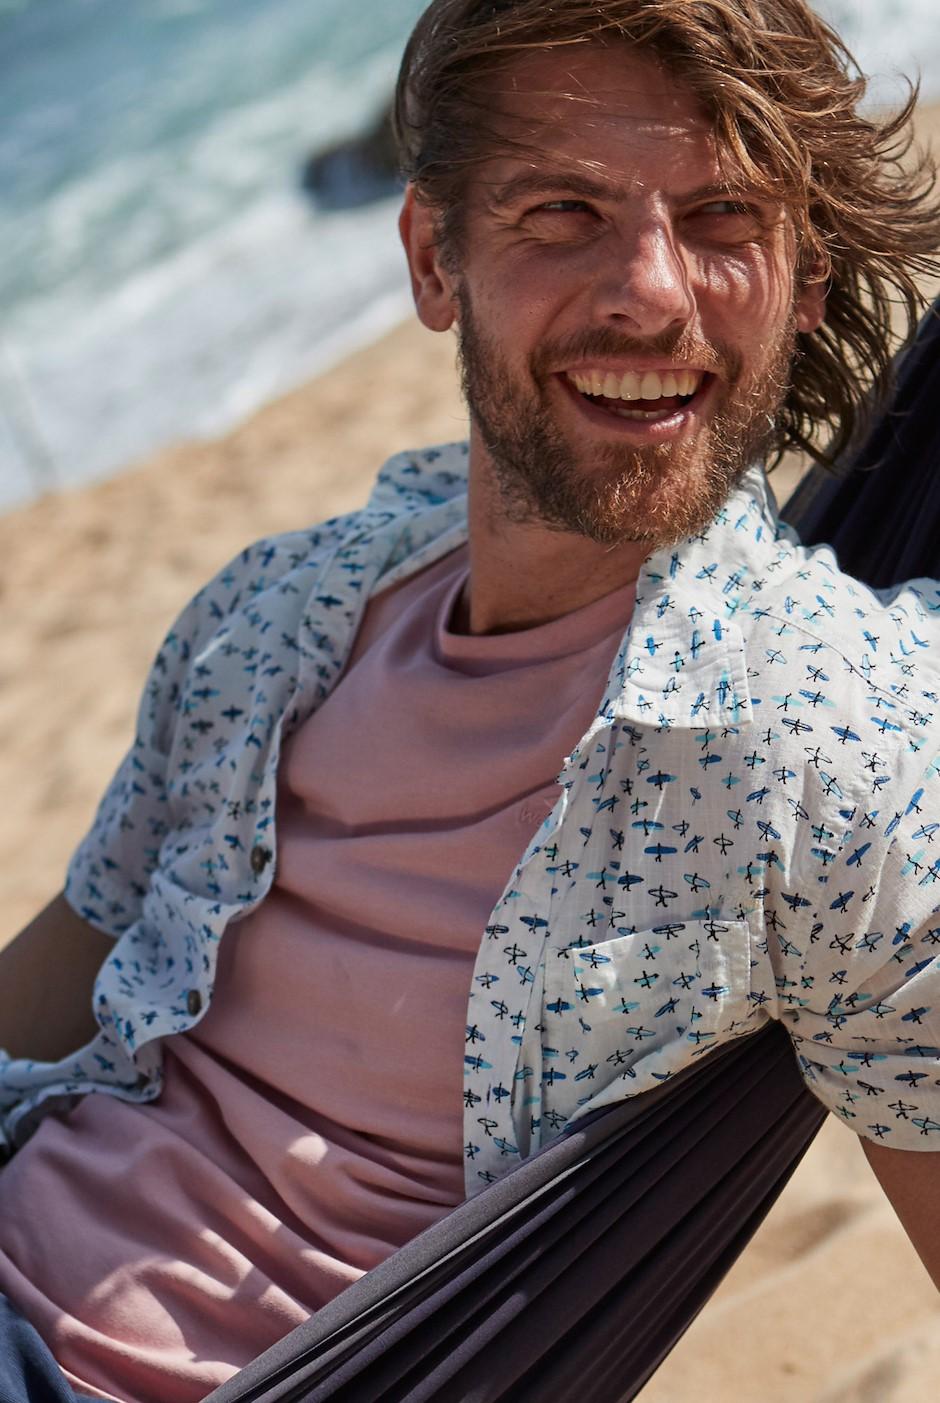 Elm Short Sleeve Patterned Shirt Marshmallow